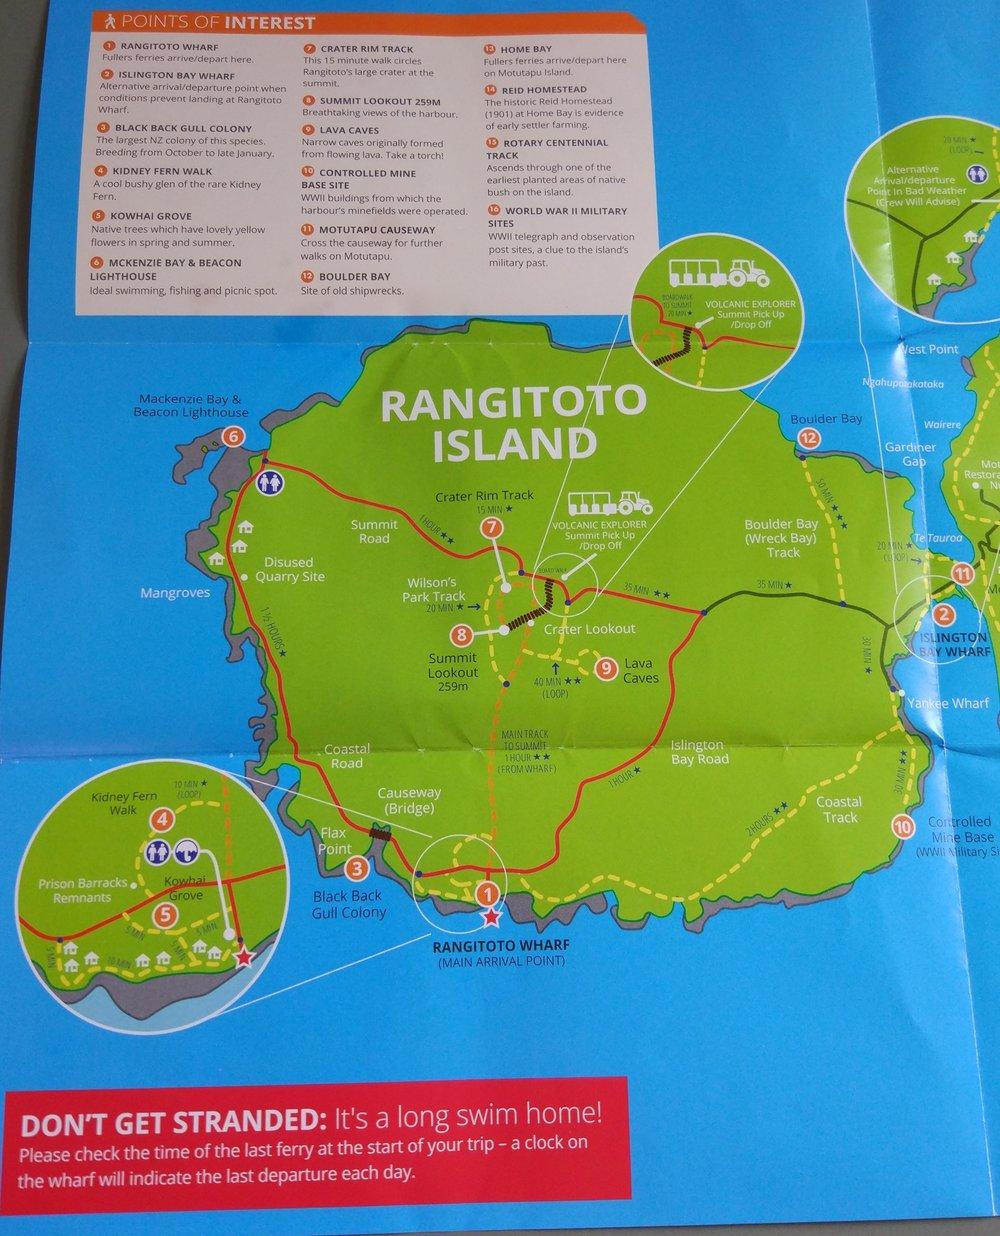 Rangitoto map with walks